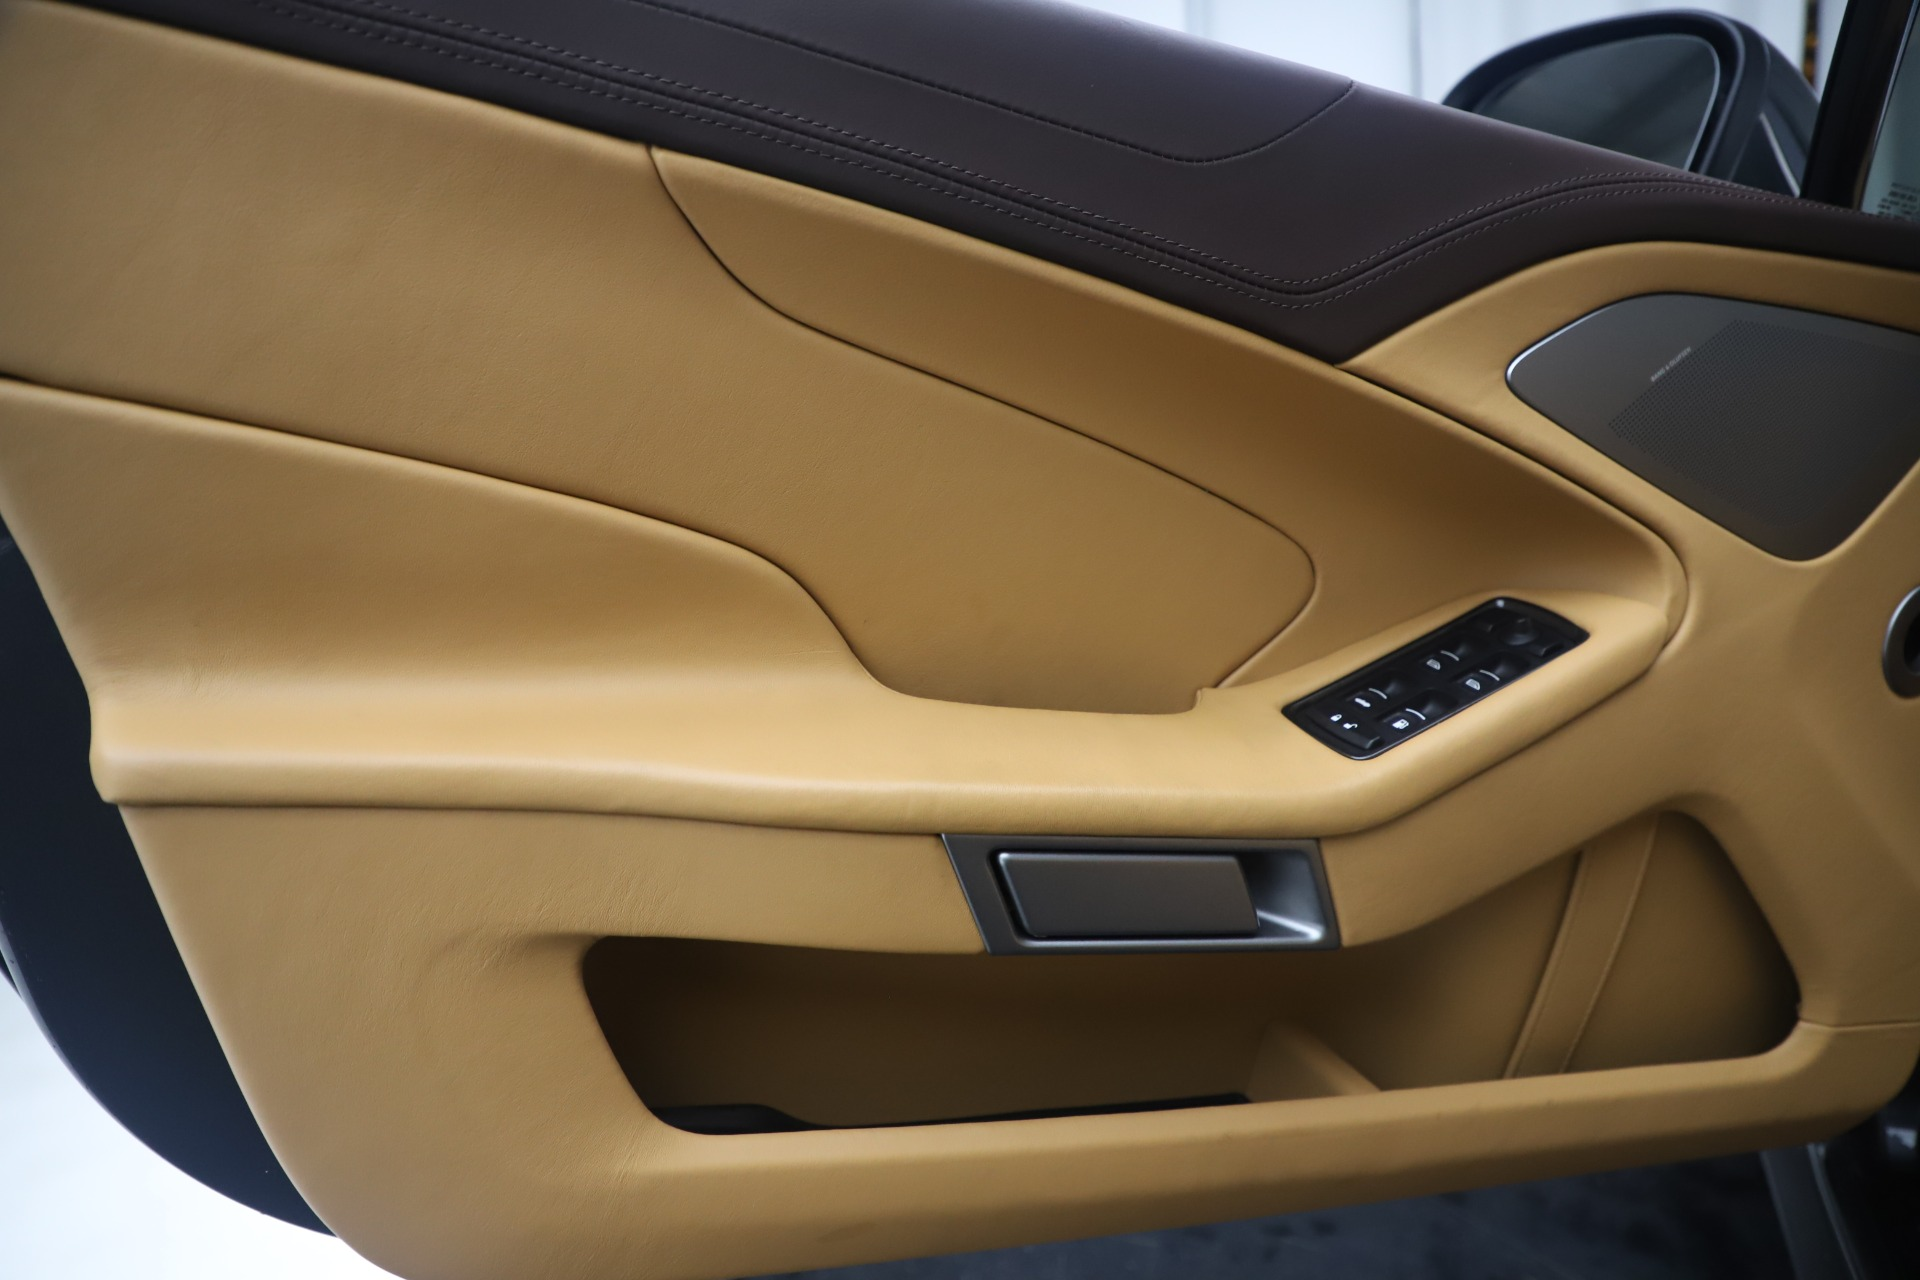 Used 2016 Aston Martin Vanquish Volante For Sale 161900 In Greenwich, CT